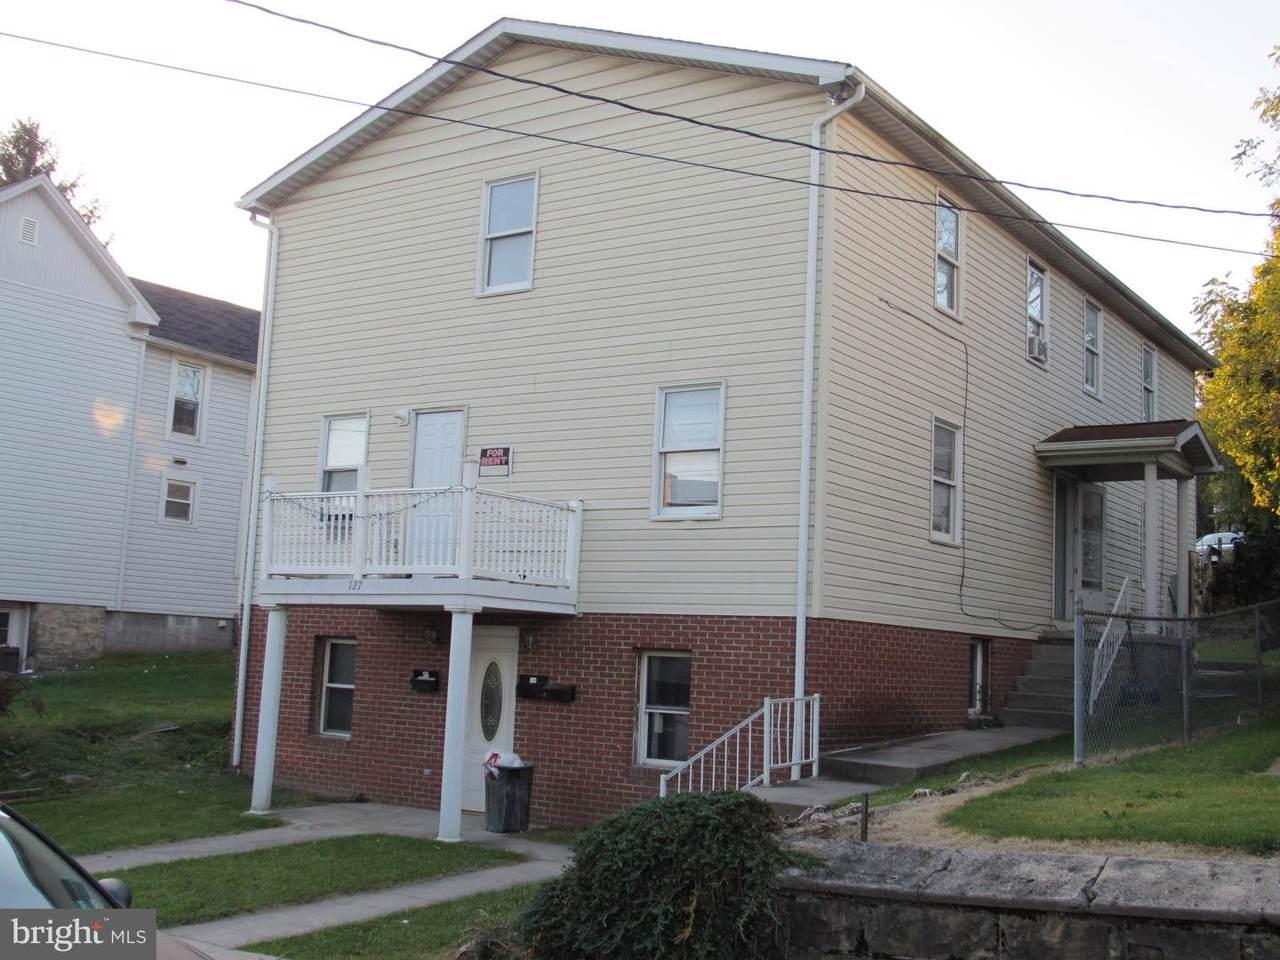 127 Wood Street - Photo 1